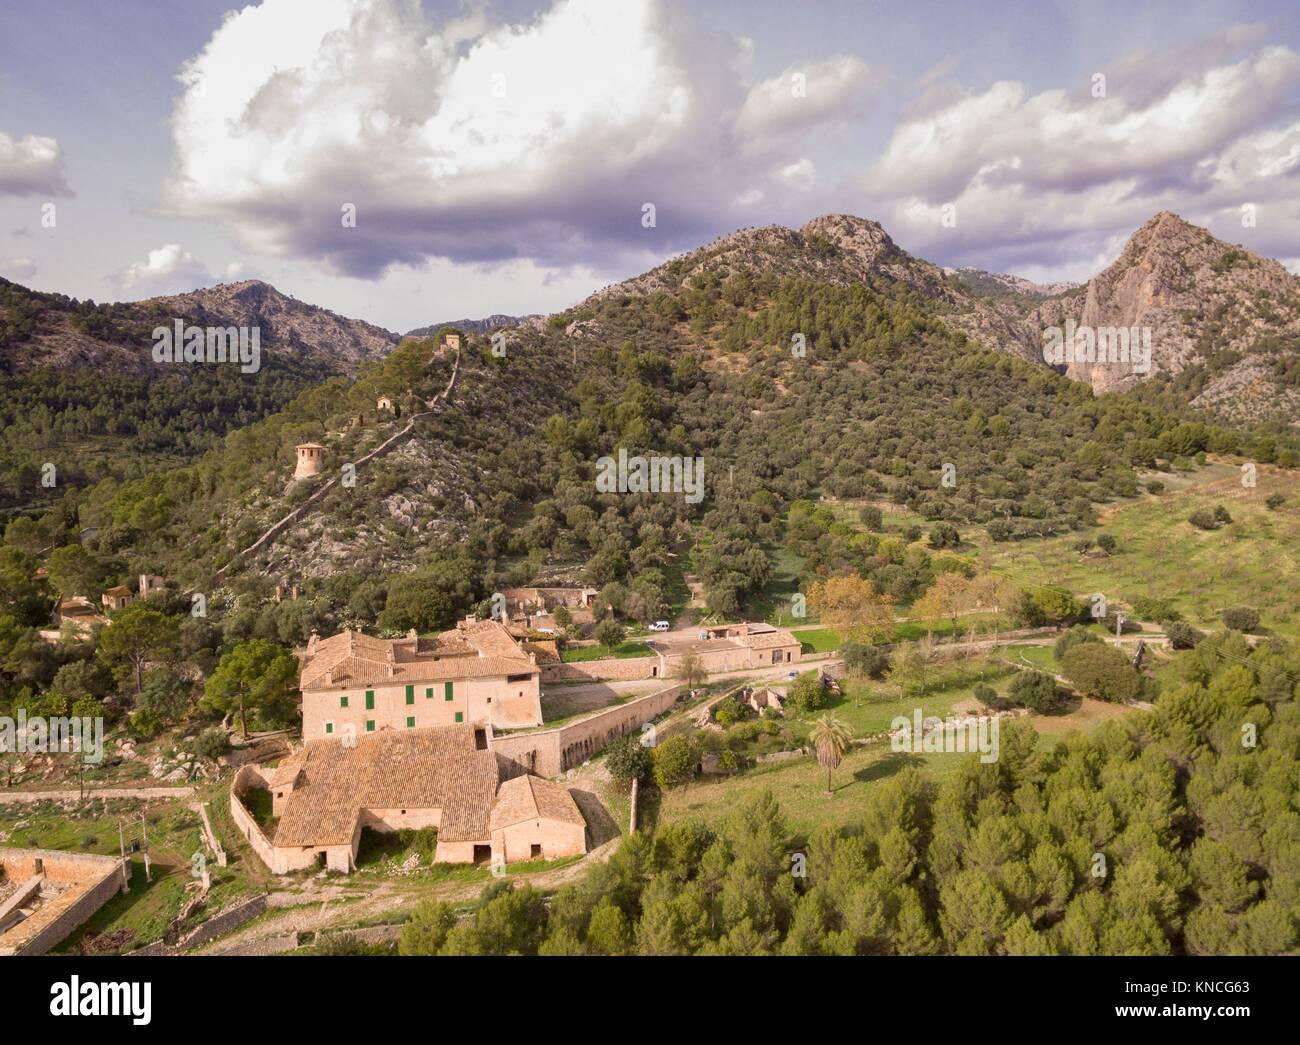 Biniazar, possession of Arab origin, Bunyola municipality, Mallorca, Balearic Islands, Spain. - Stock Image